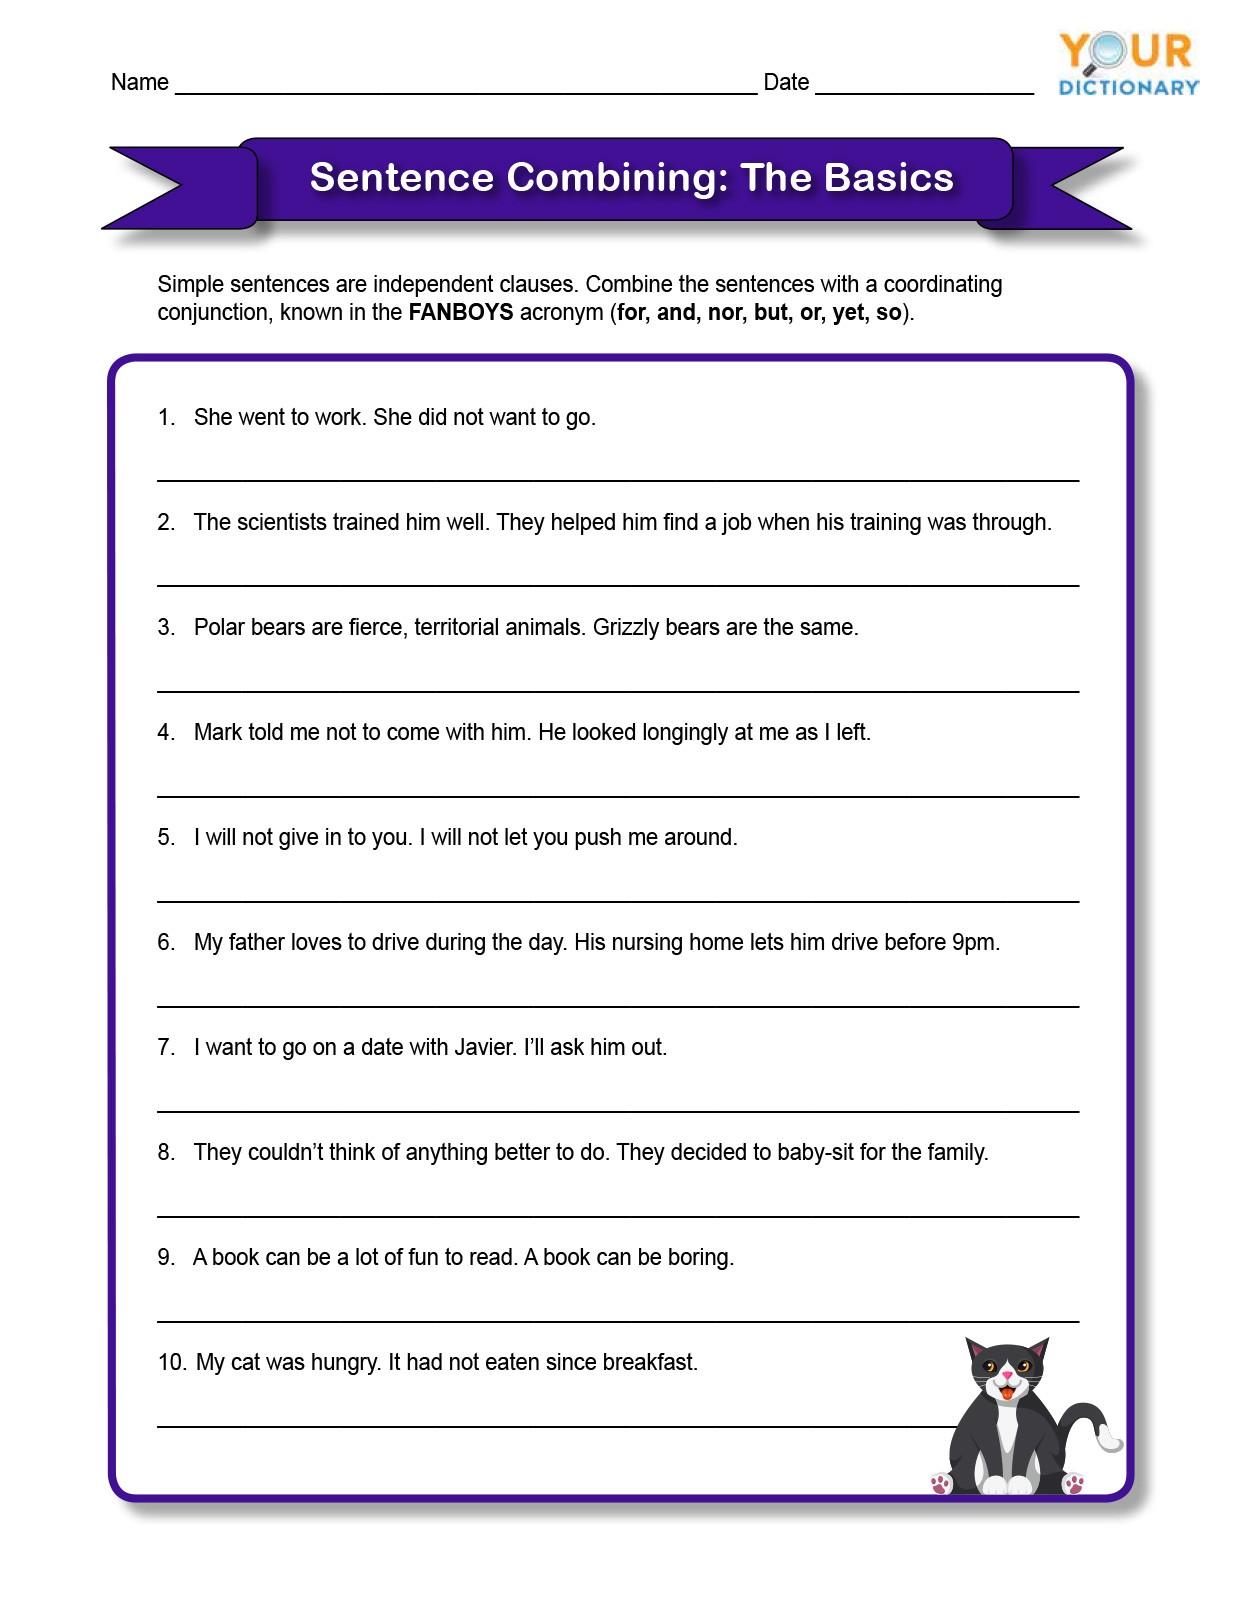 the basics of sentence combining